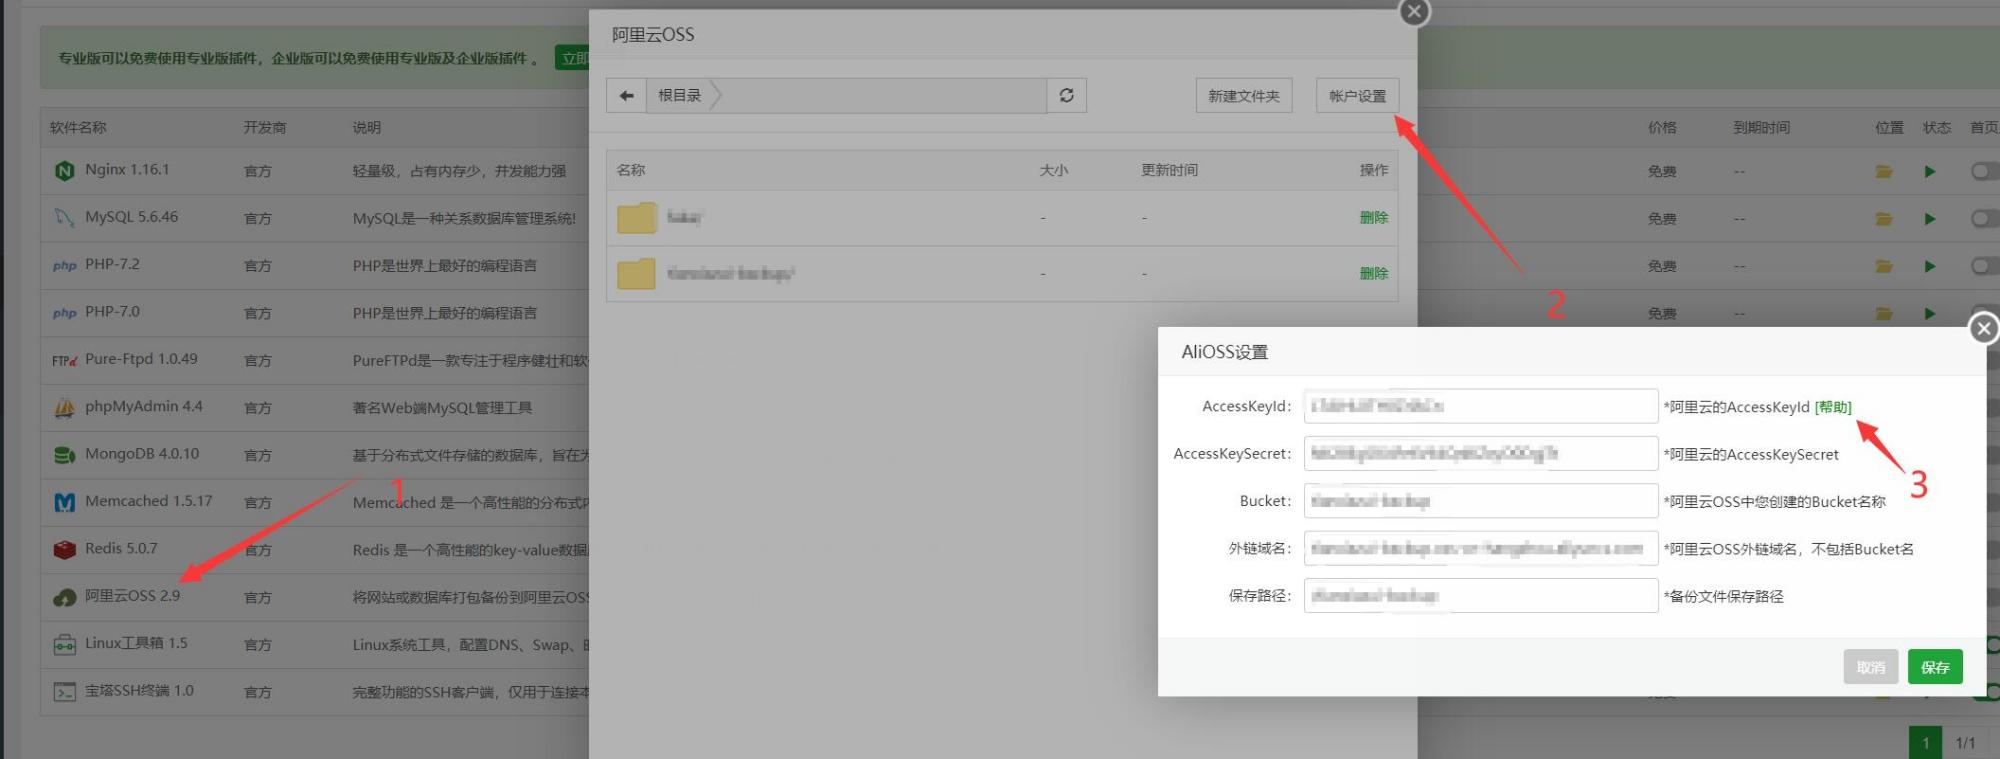 wordpress进阶设置和高级优化:采用 OSS 备份网站数据  第1张